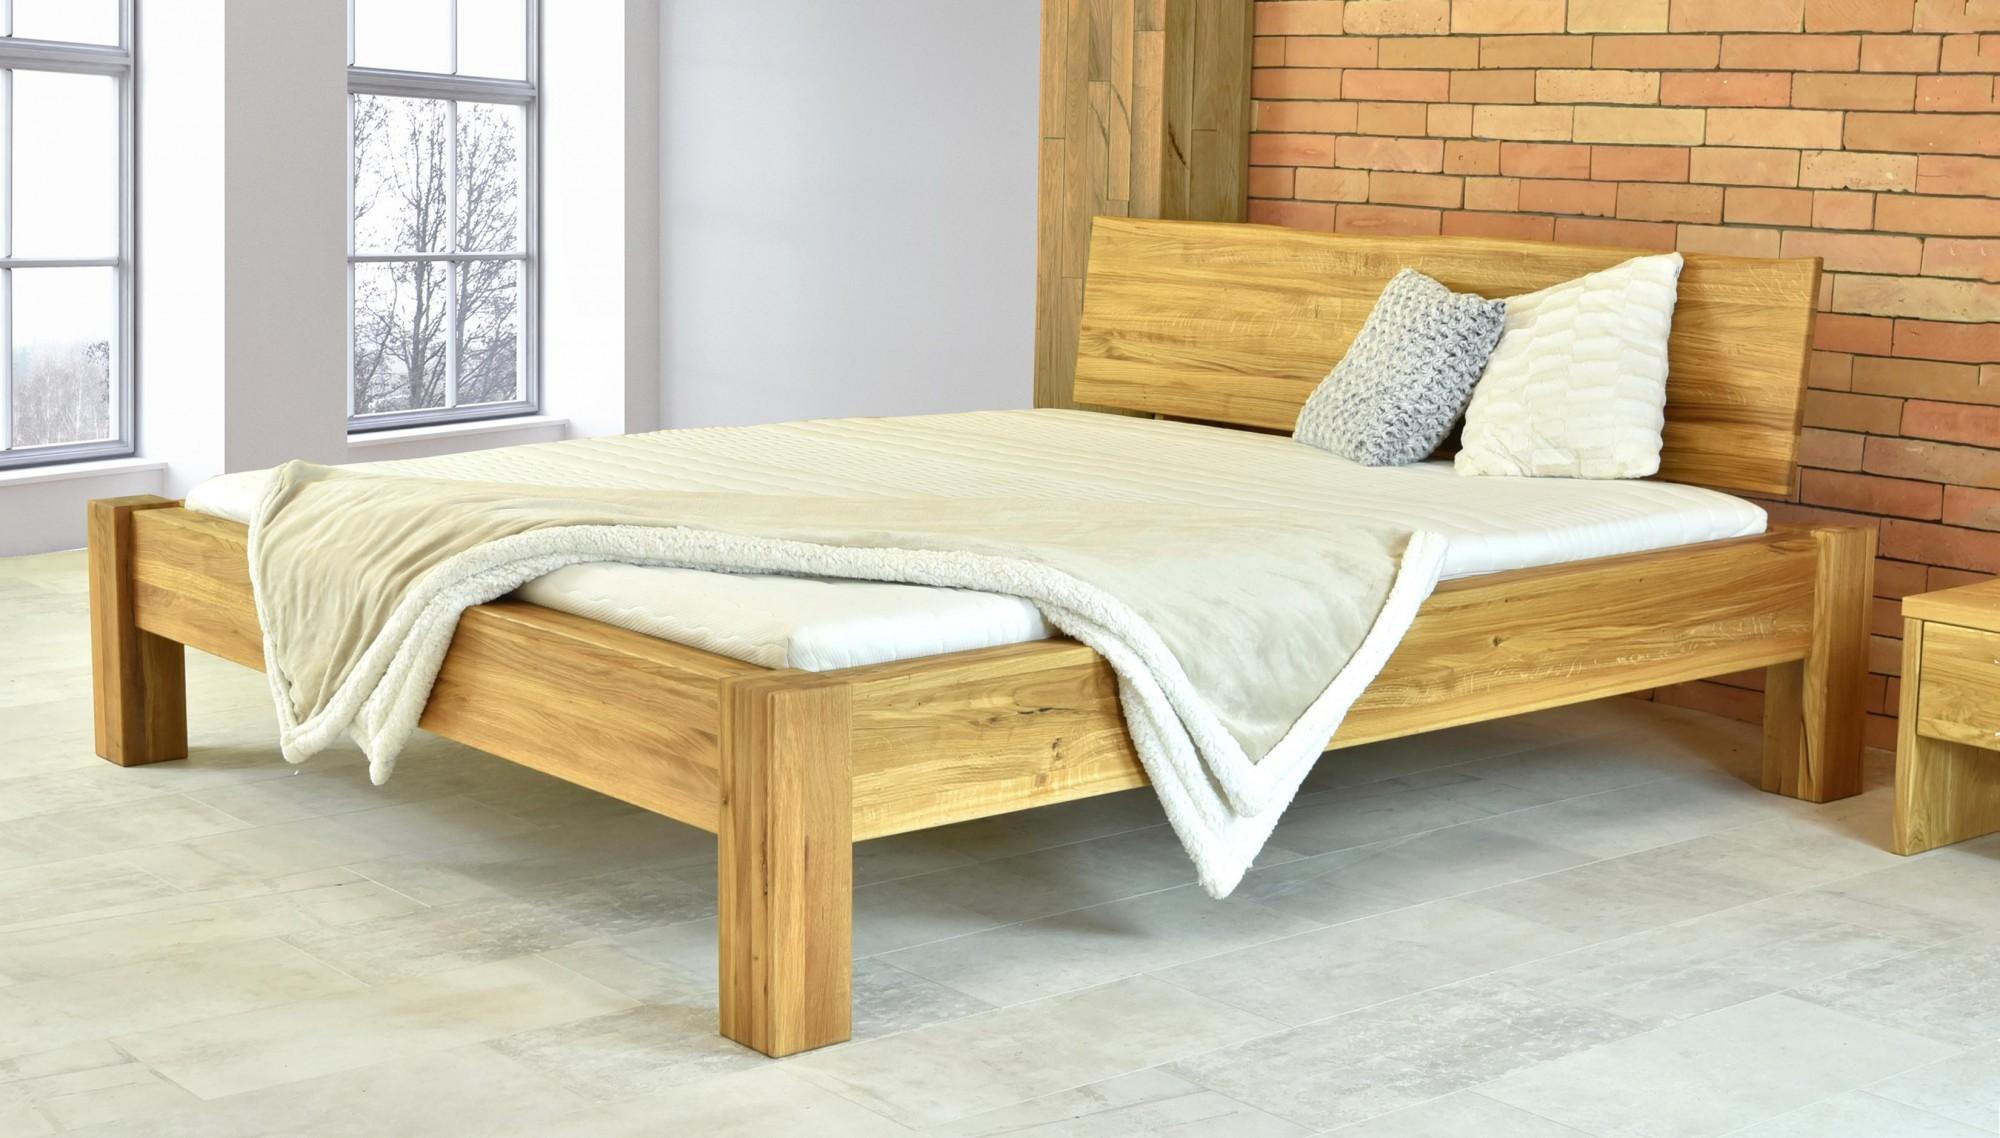 Dubová posteľ masív